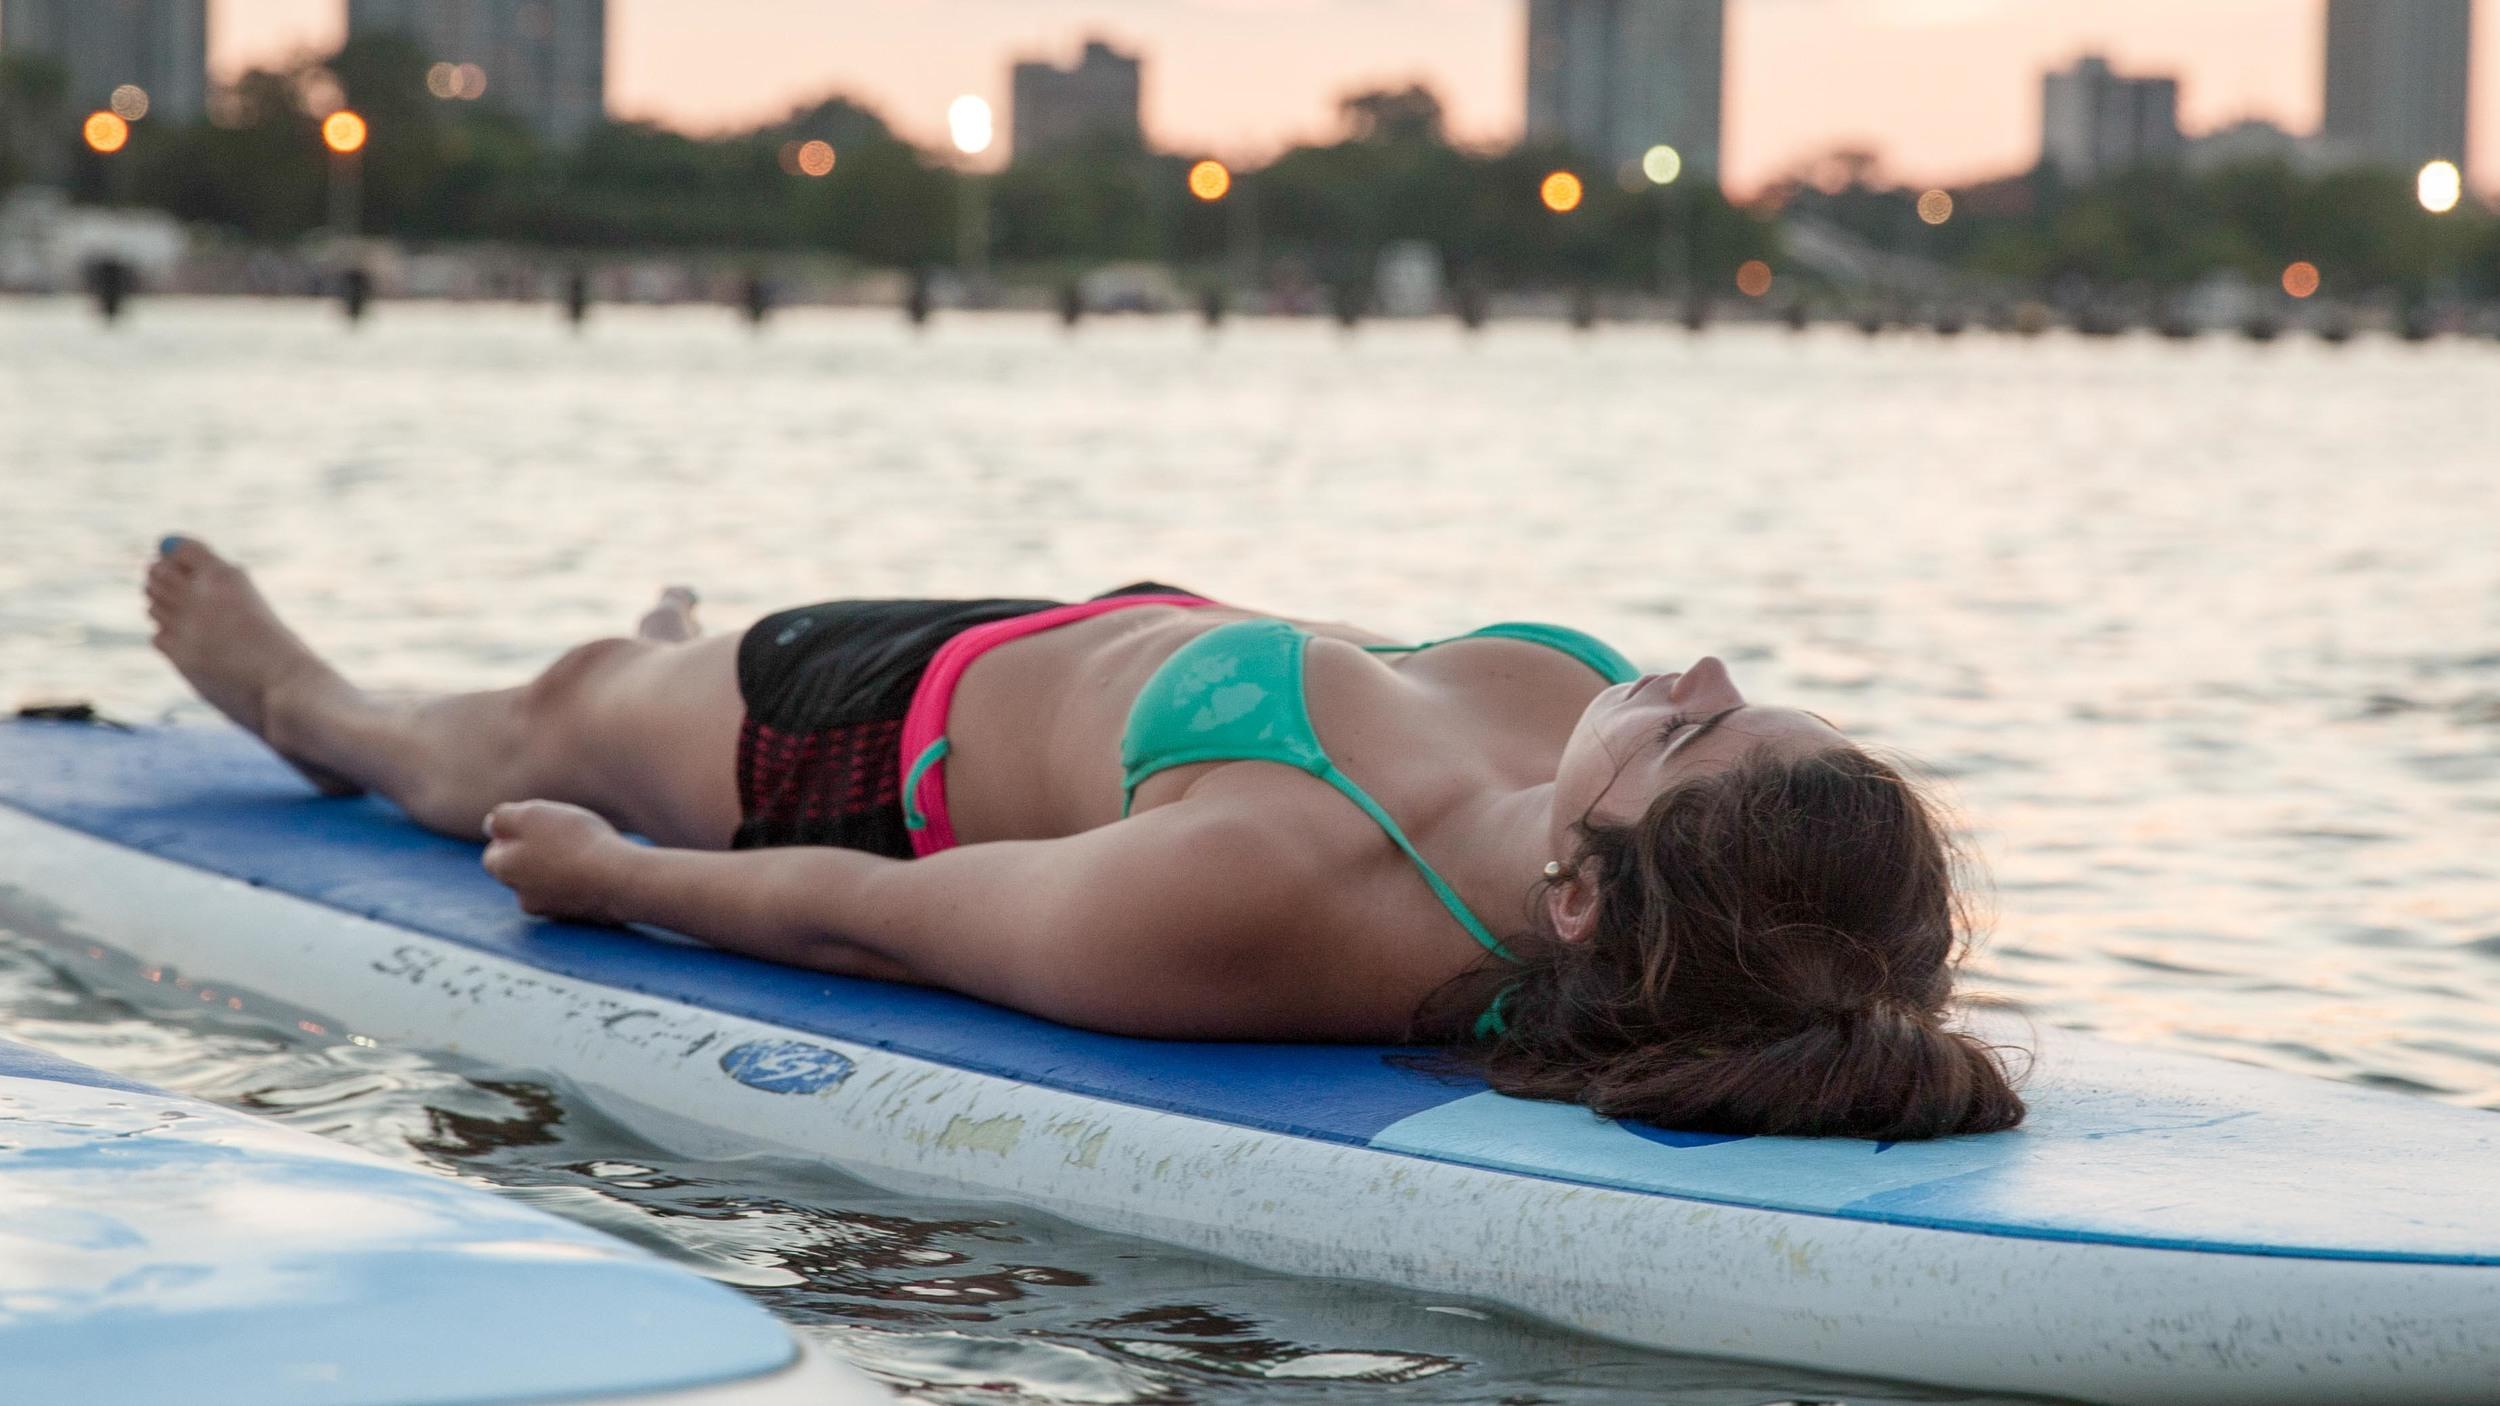 ChicagoSUP Yoga Fitness Photo (3 of 9).jpg